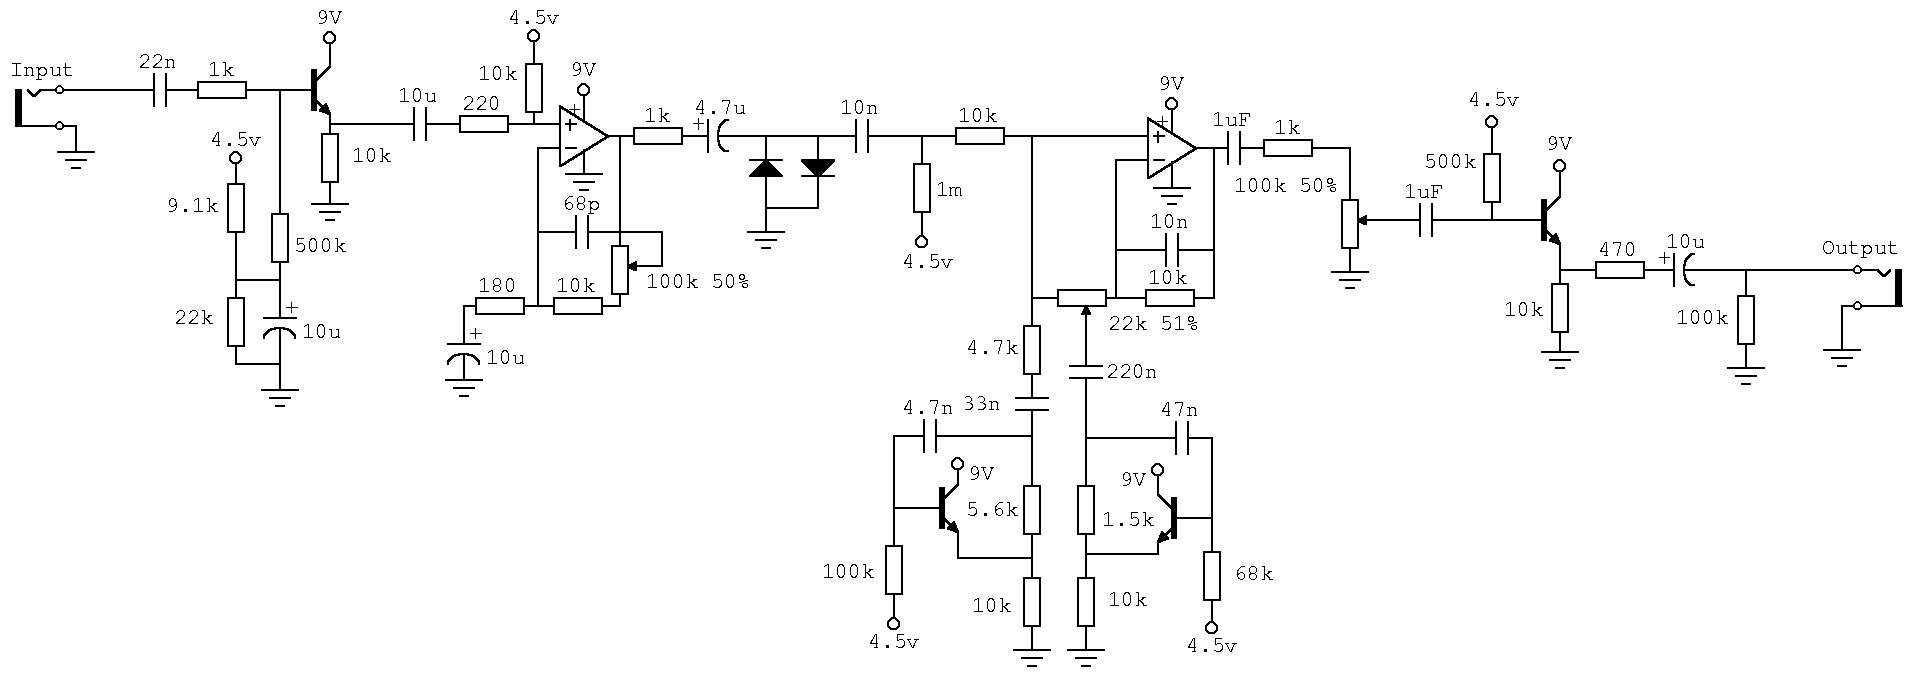 ibanez rg370 wiring diagram  u2013 stateofindiana co